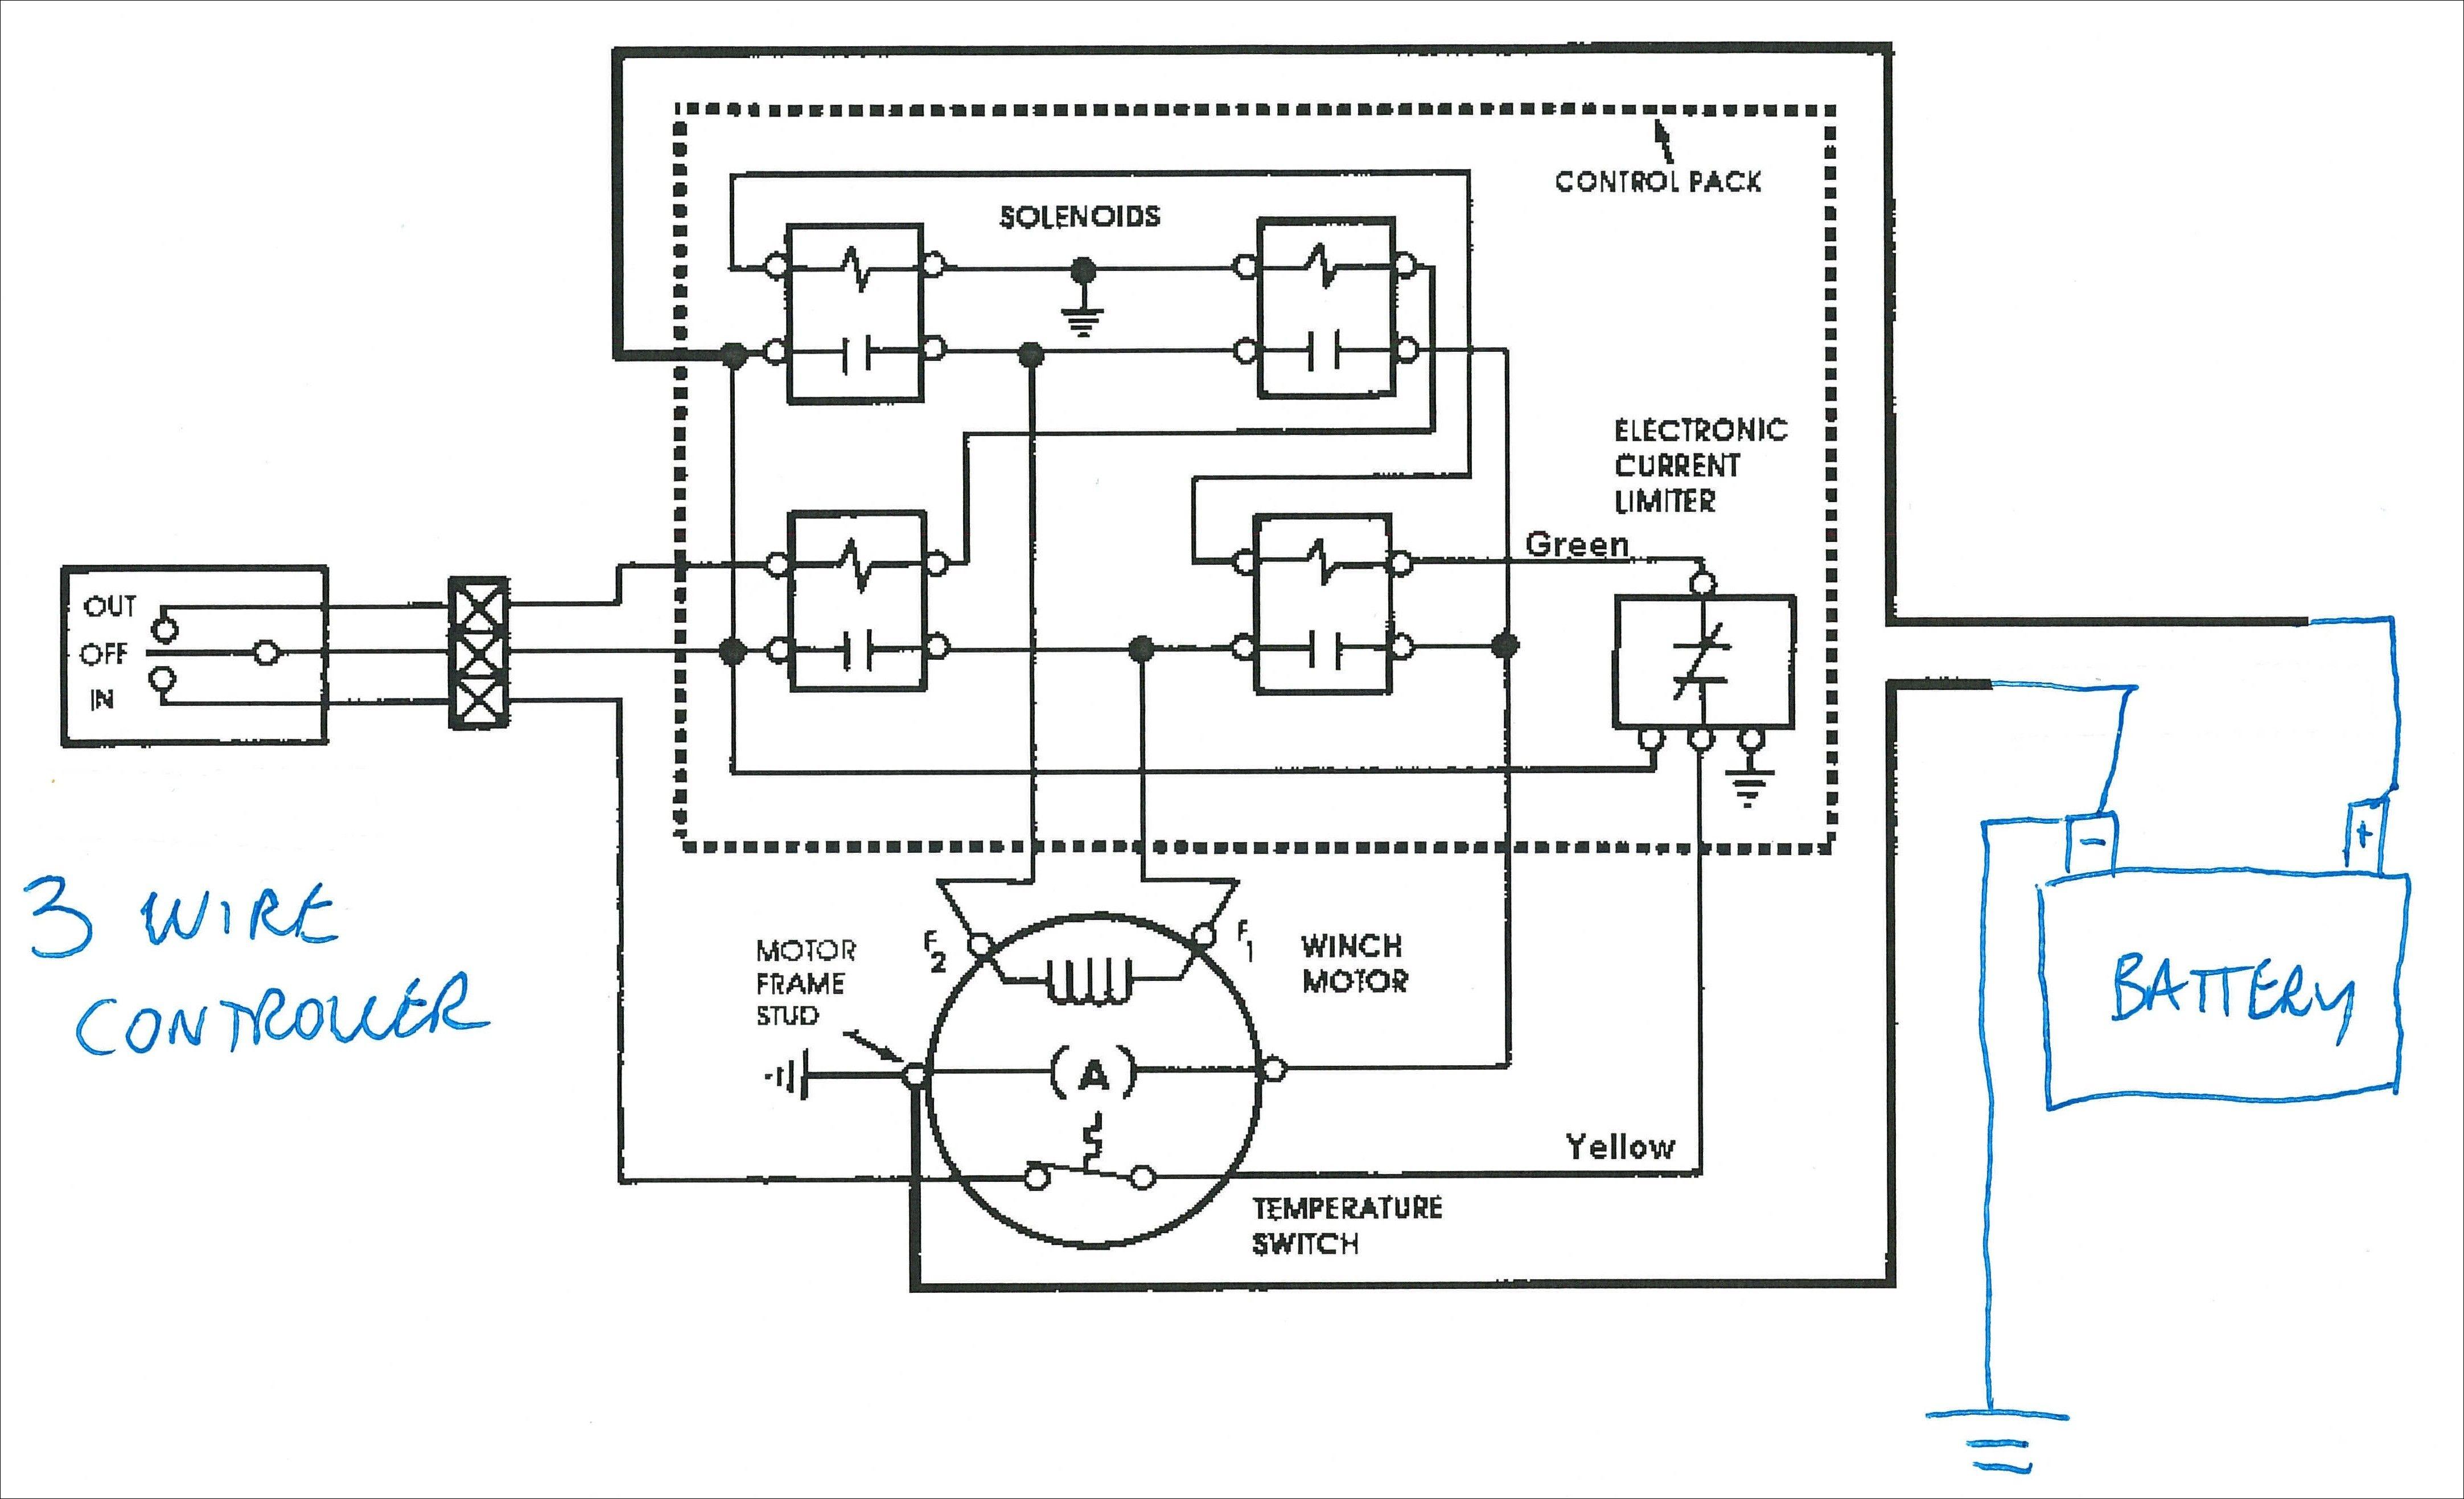 [DIAGRAM_5UK]  FE_9182] Warn Winch Wiring Diagram Further Warn Atv Winch Wiring Diagram  Free Diagram | A2500 Warn Wiring Diagram |  | Usnes Cajos Mohammedshrine Librar Wiring 101